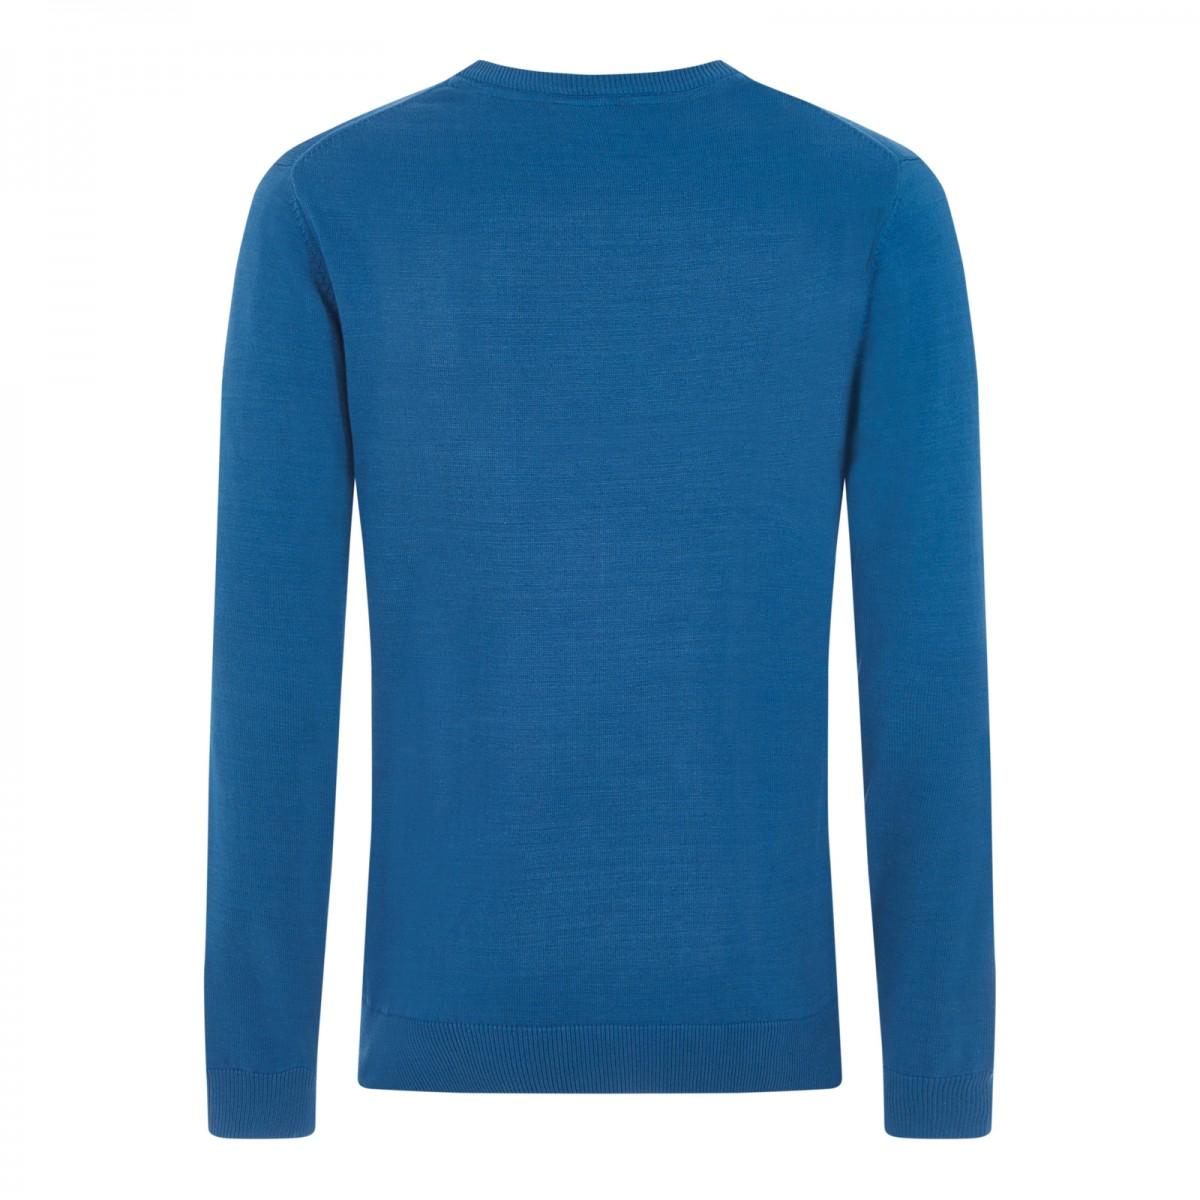 Sweter MERC LONDON VERNON niebieski